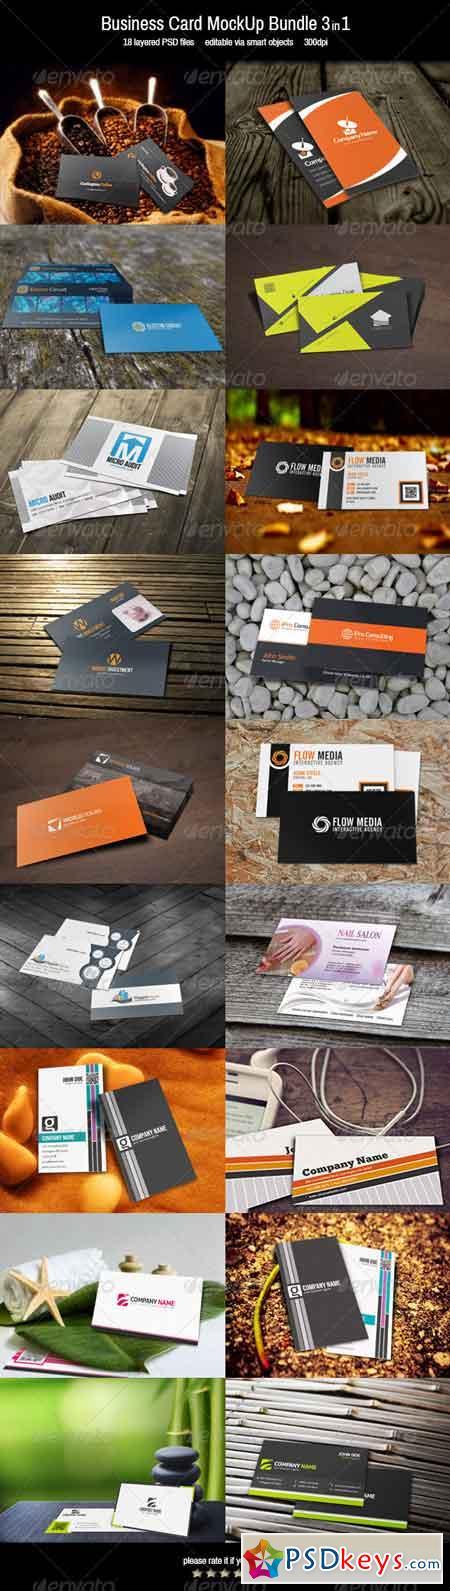 Mockup bundle free download photoshop vector stock image via business card mockup bundle 3in1 7254693 reheart Images